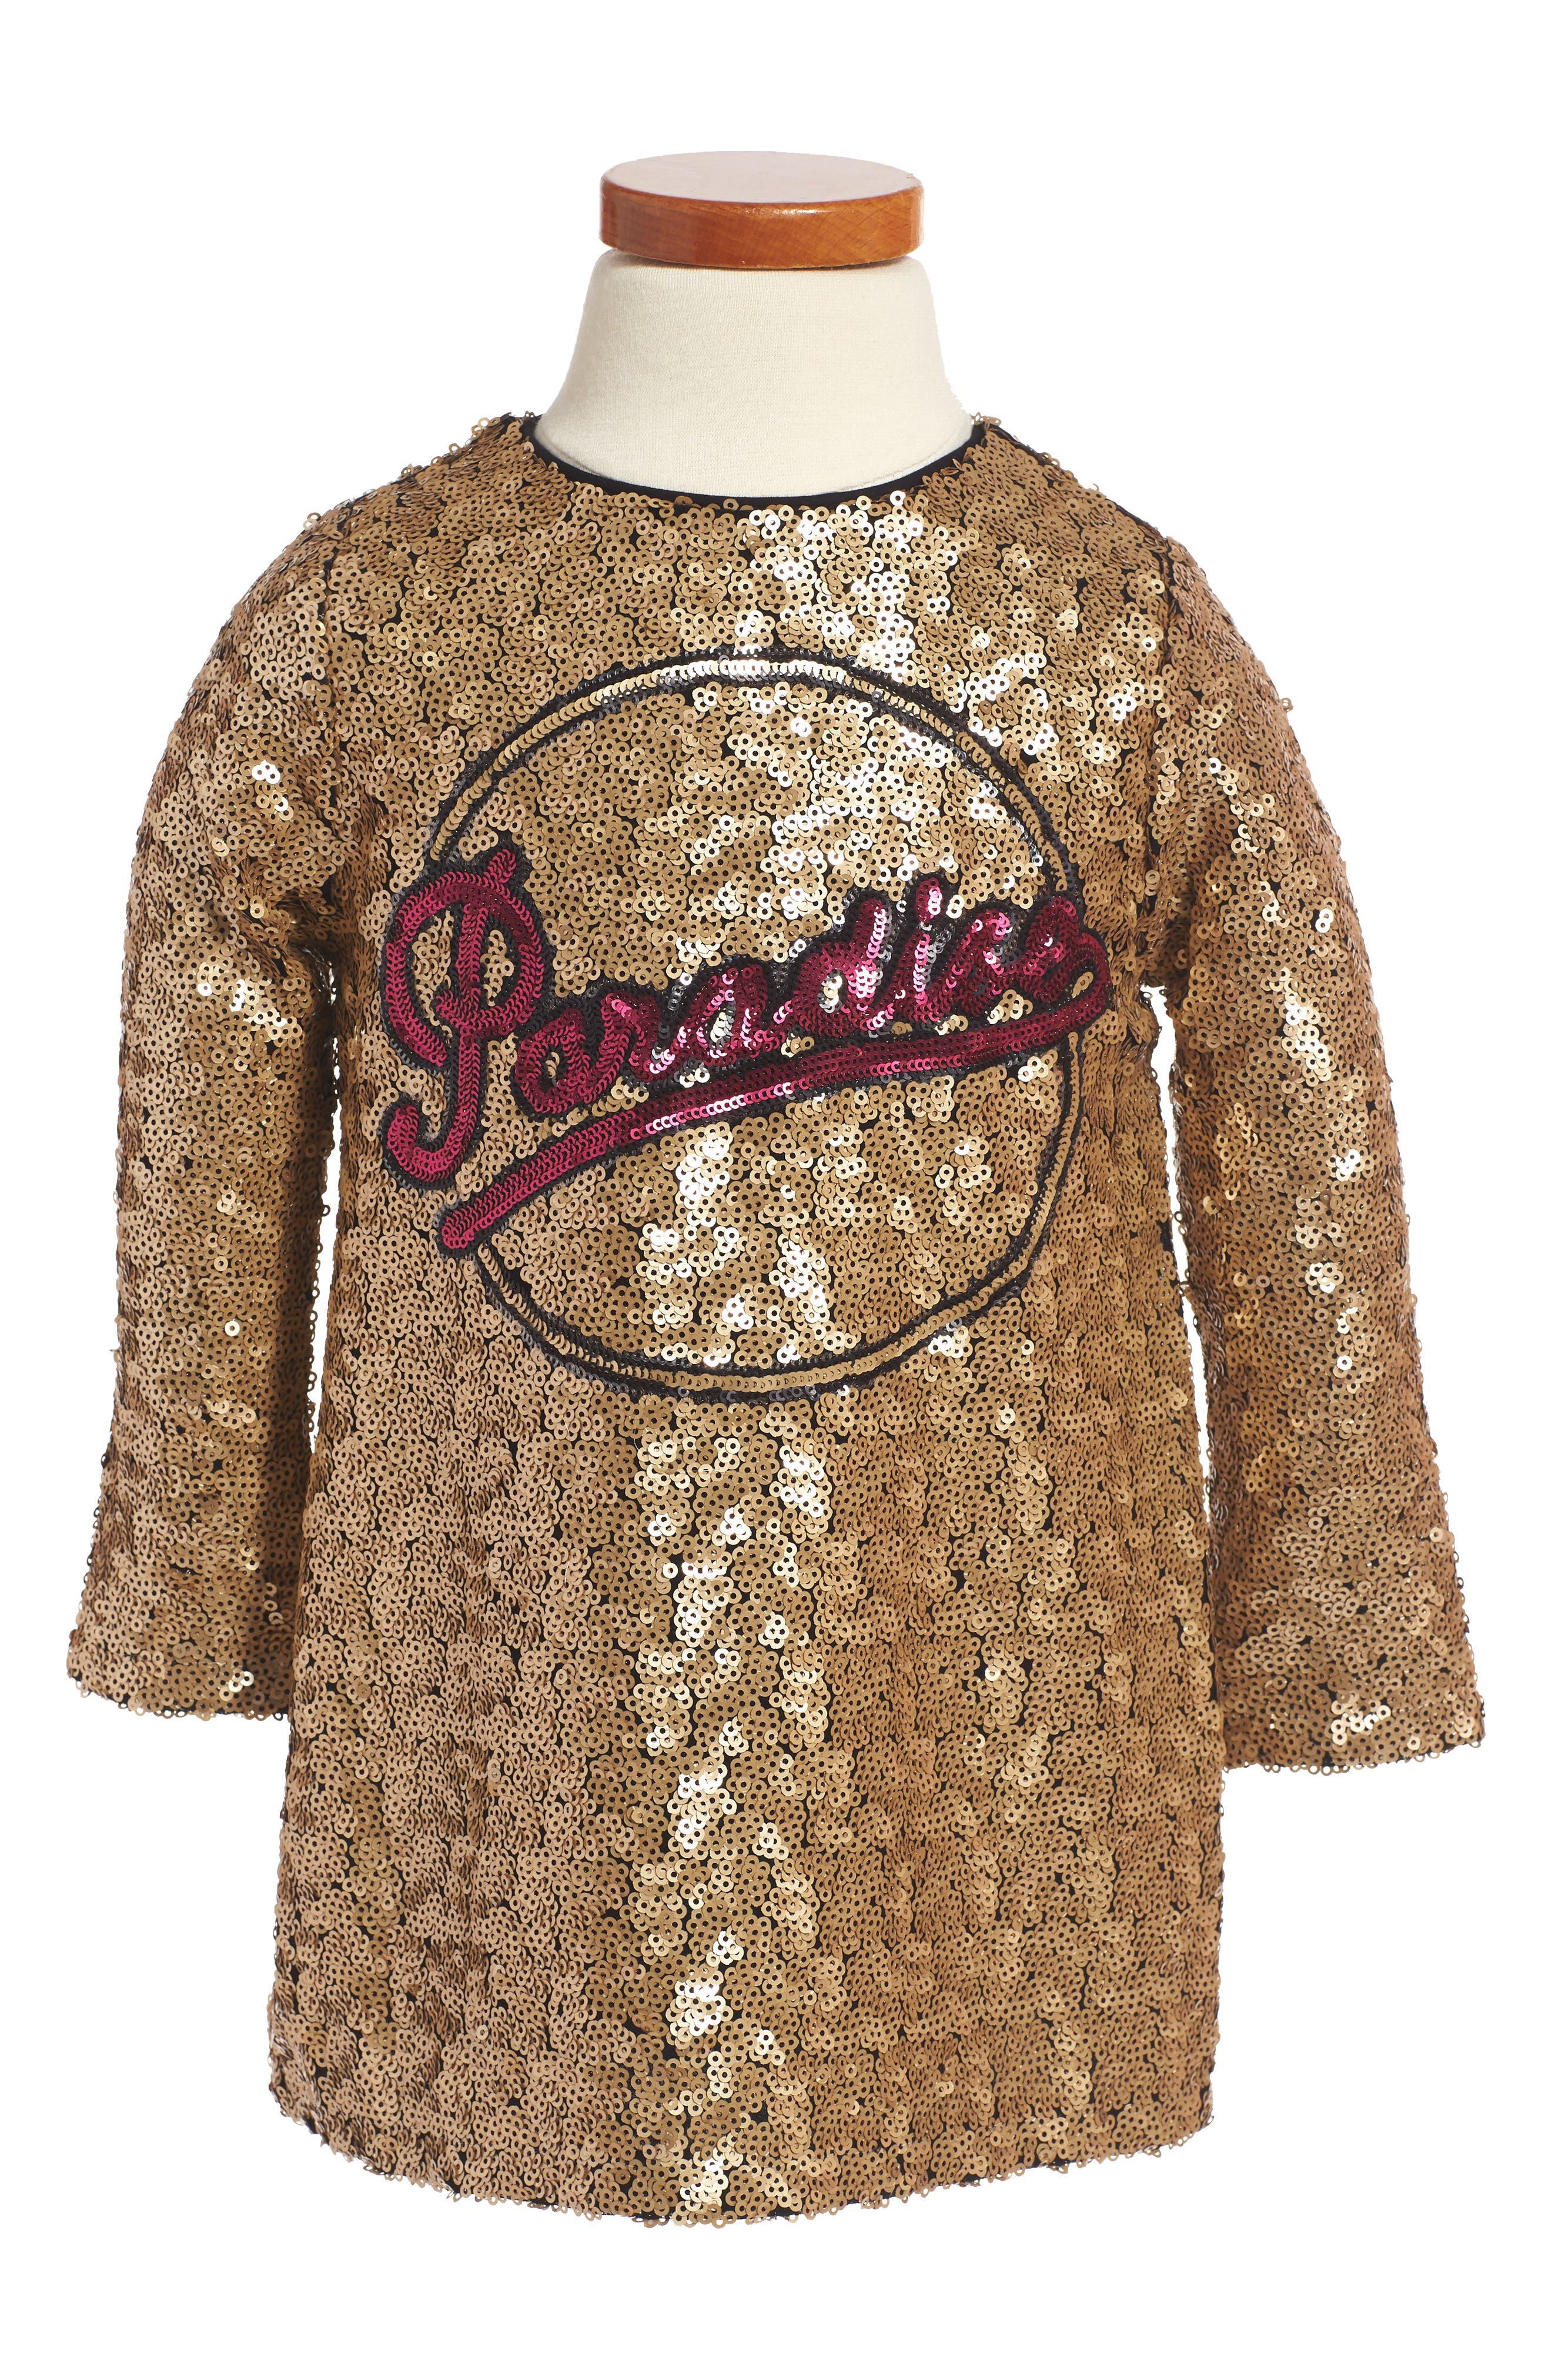 LITTLE MARC JACOBS Paradise Sequin Shift Dress (Toddler Girls, Little Girls & Big Girls)